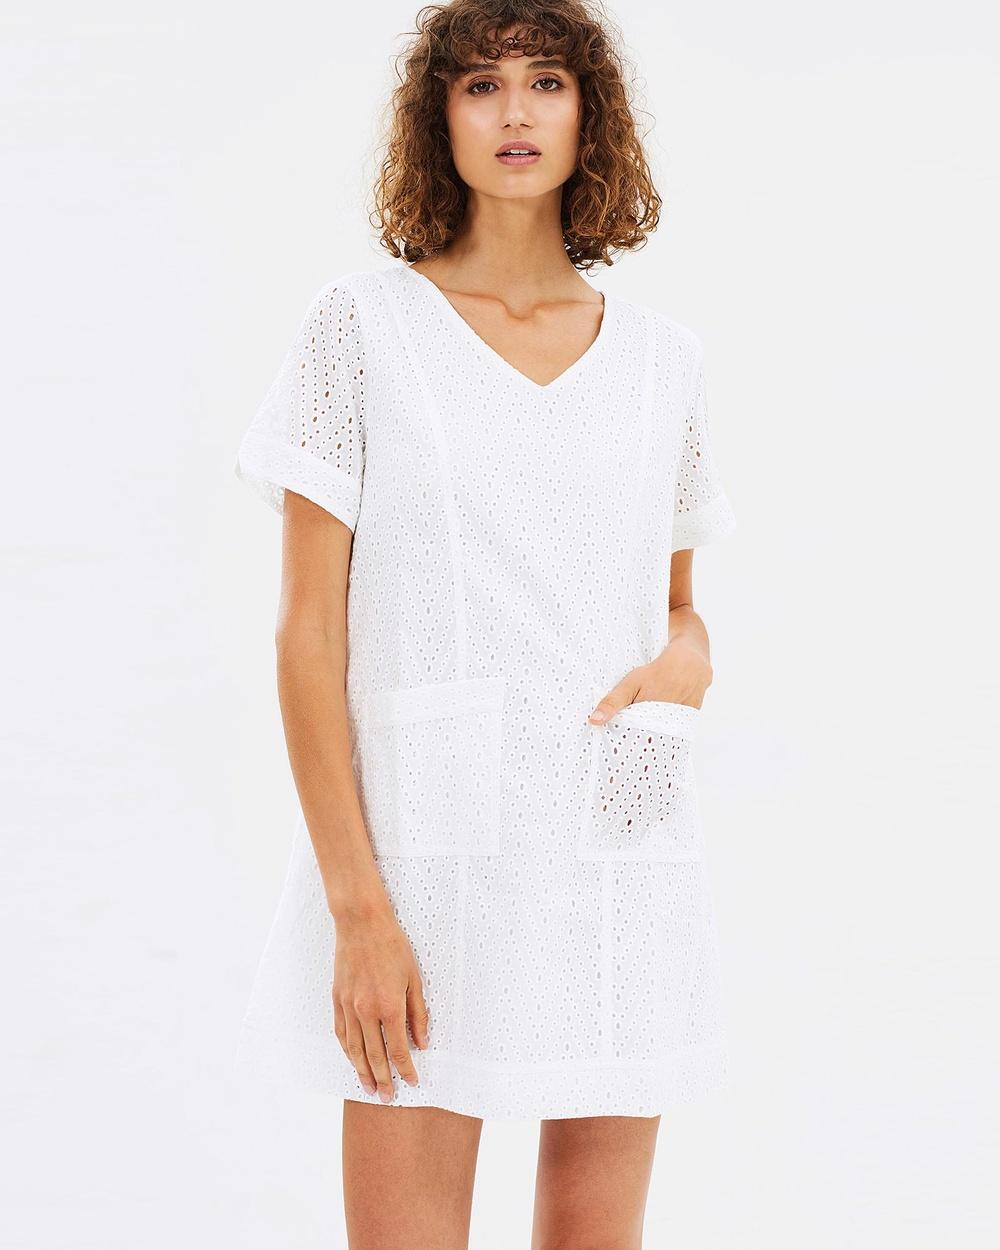 Ryder Lina Lace Shift Dress Dresses White Lina Lace Shift Dress